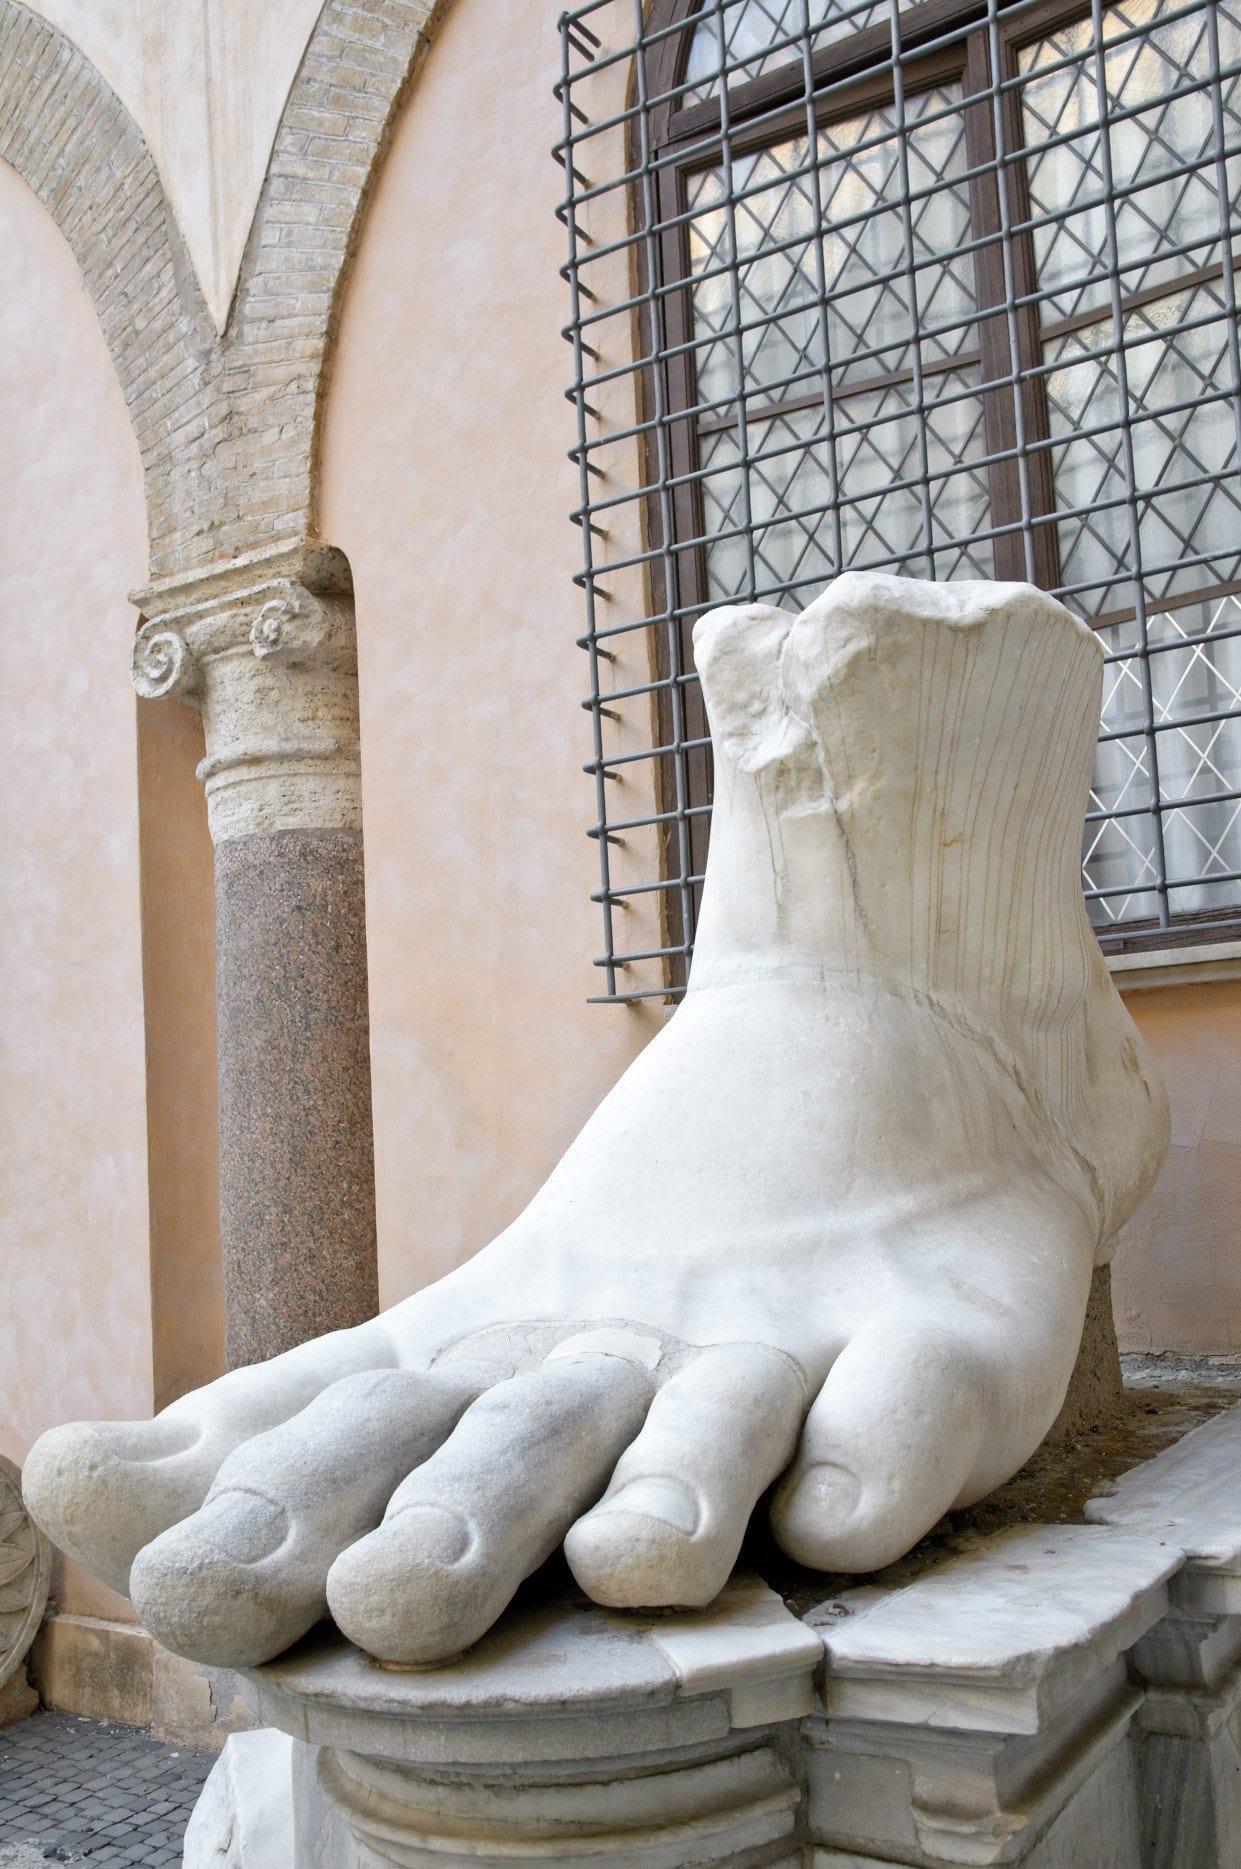 Foot of emperor Constantine